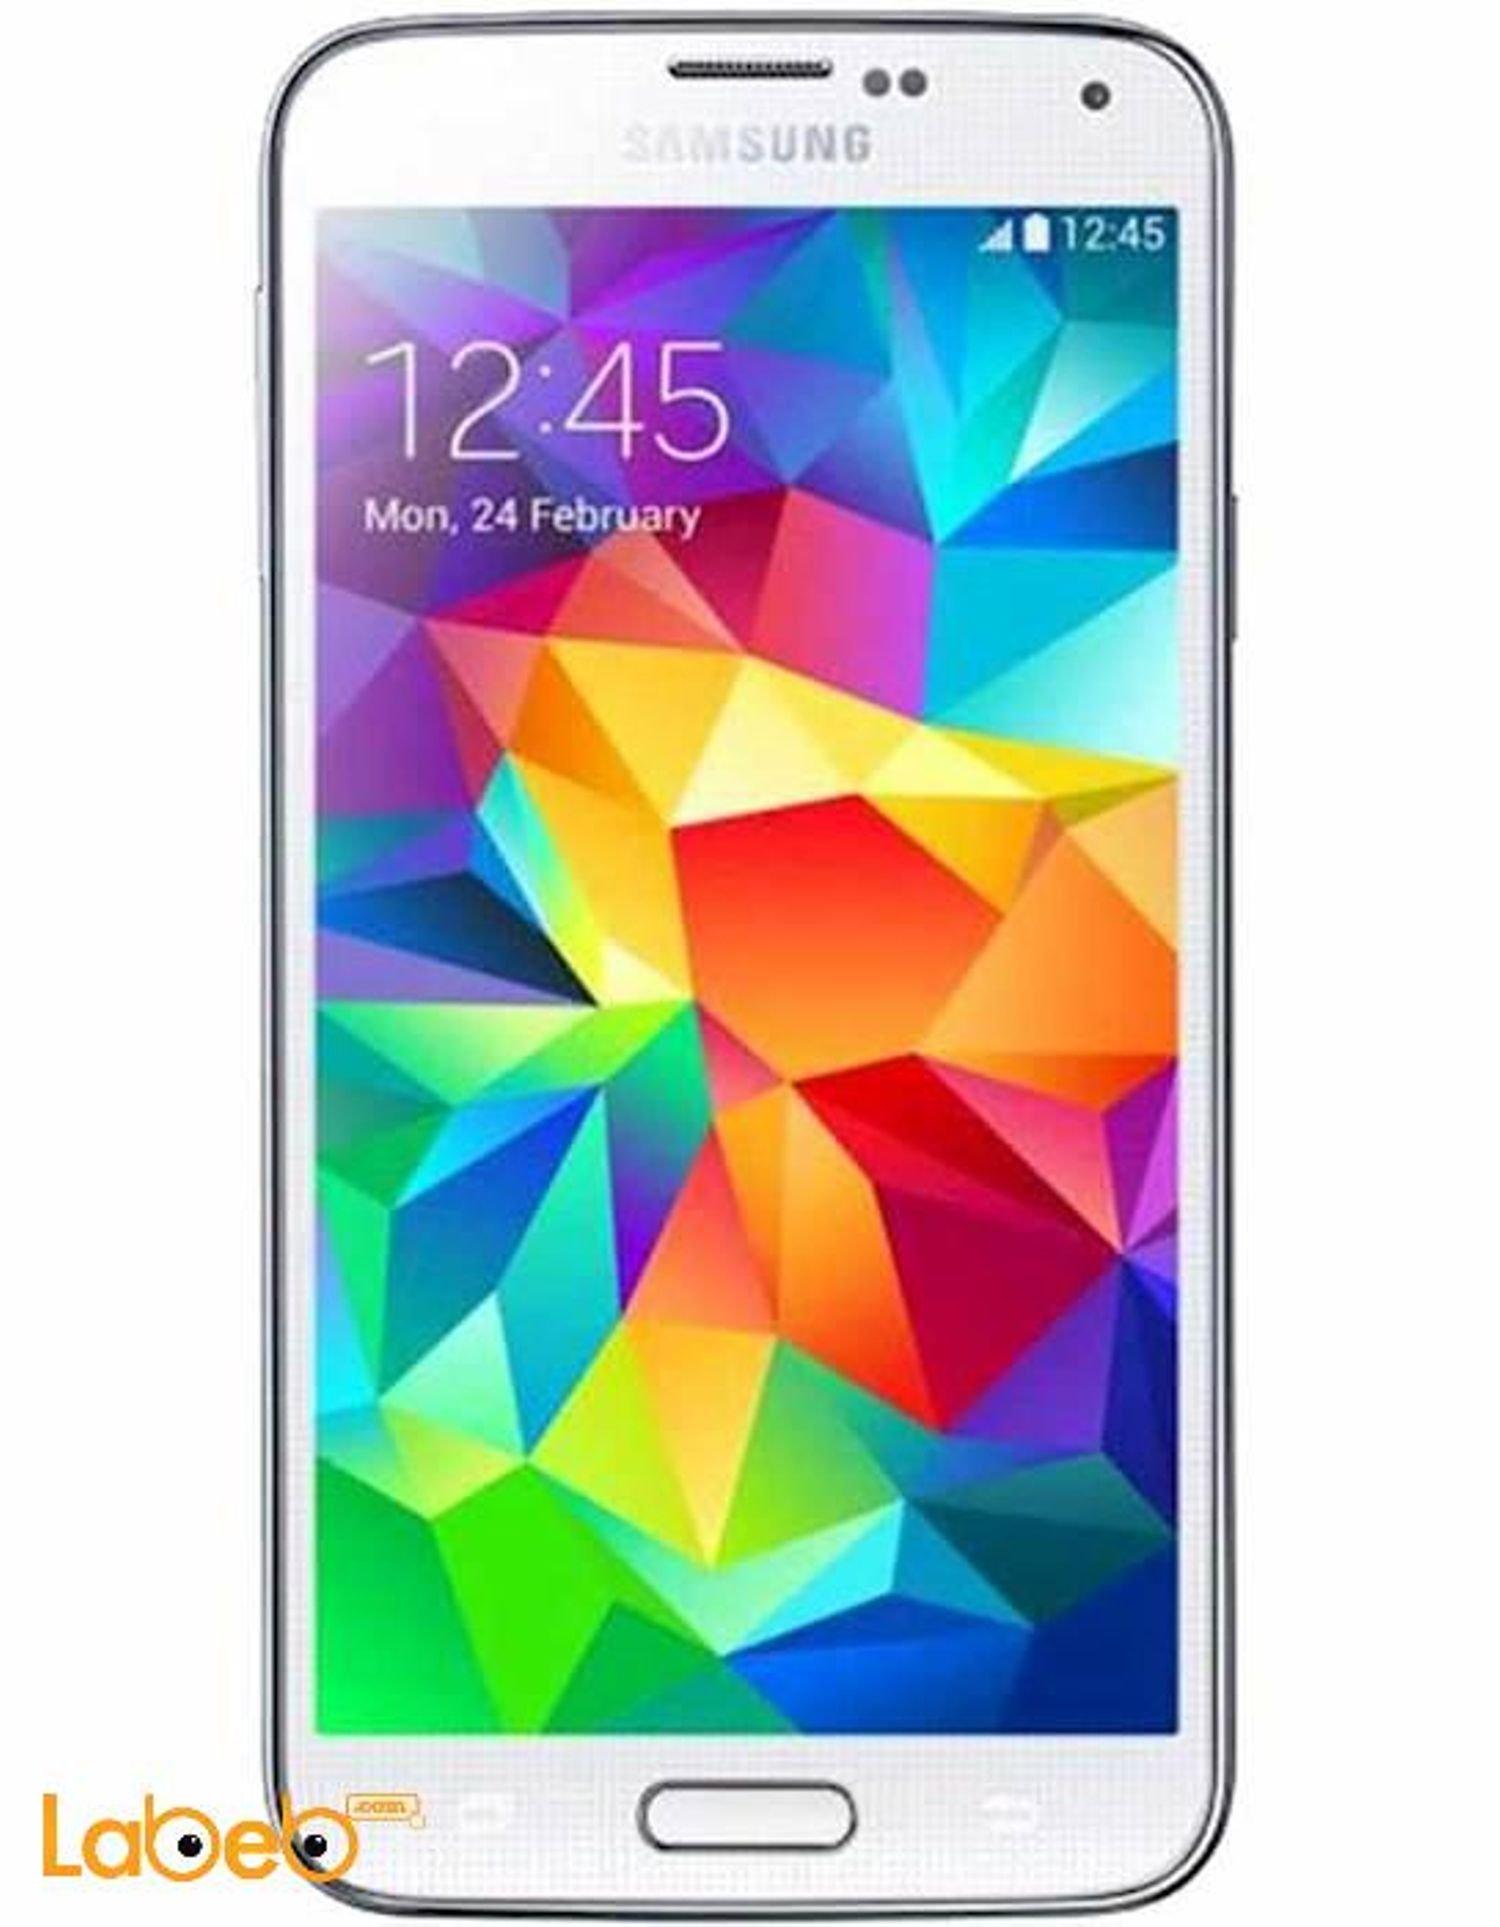 Jual Samsung Galaxy V2 J106 Smartphone White 8gb 1gb Update 2018 Putih Https En Aboutus Jolabeb 42867 700 W1500